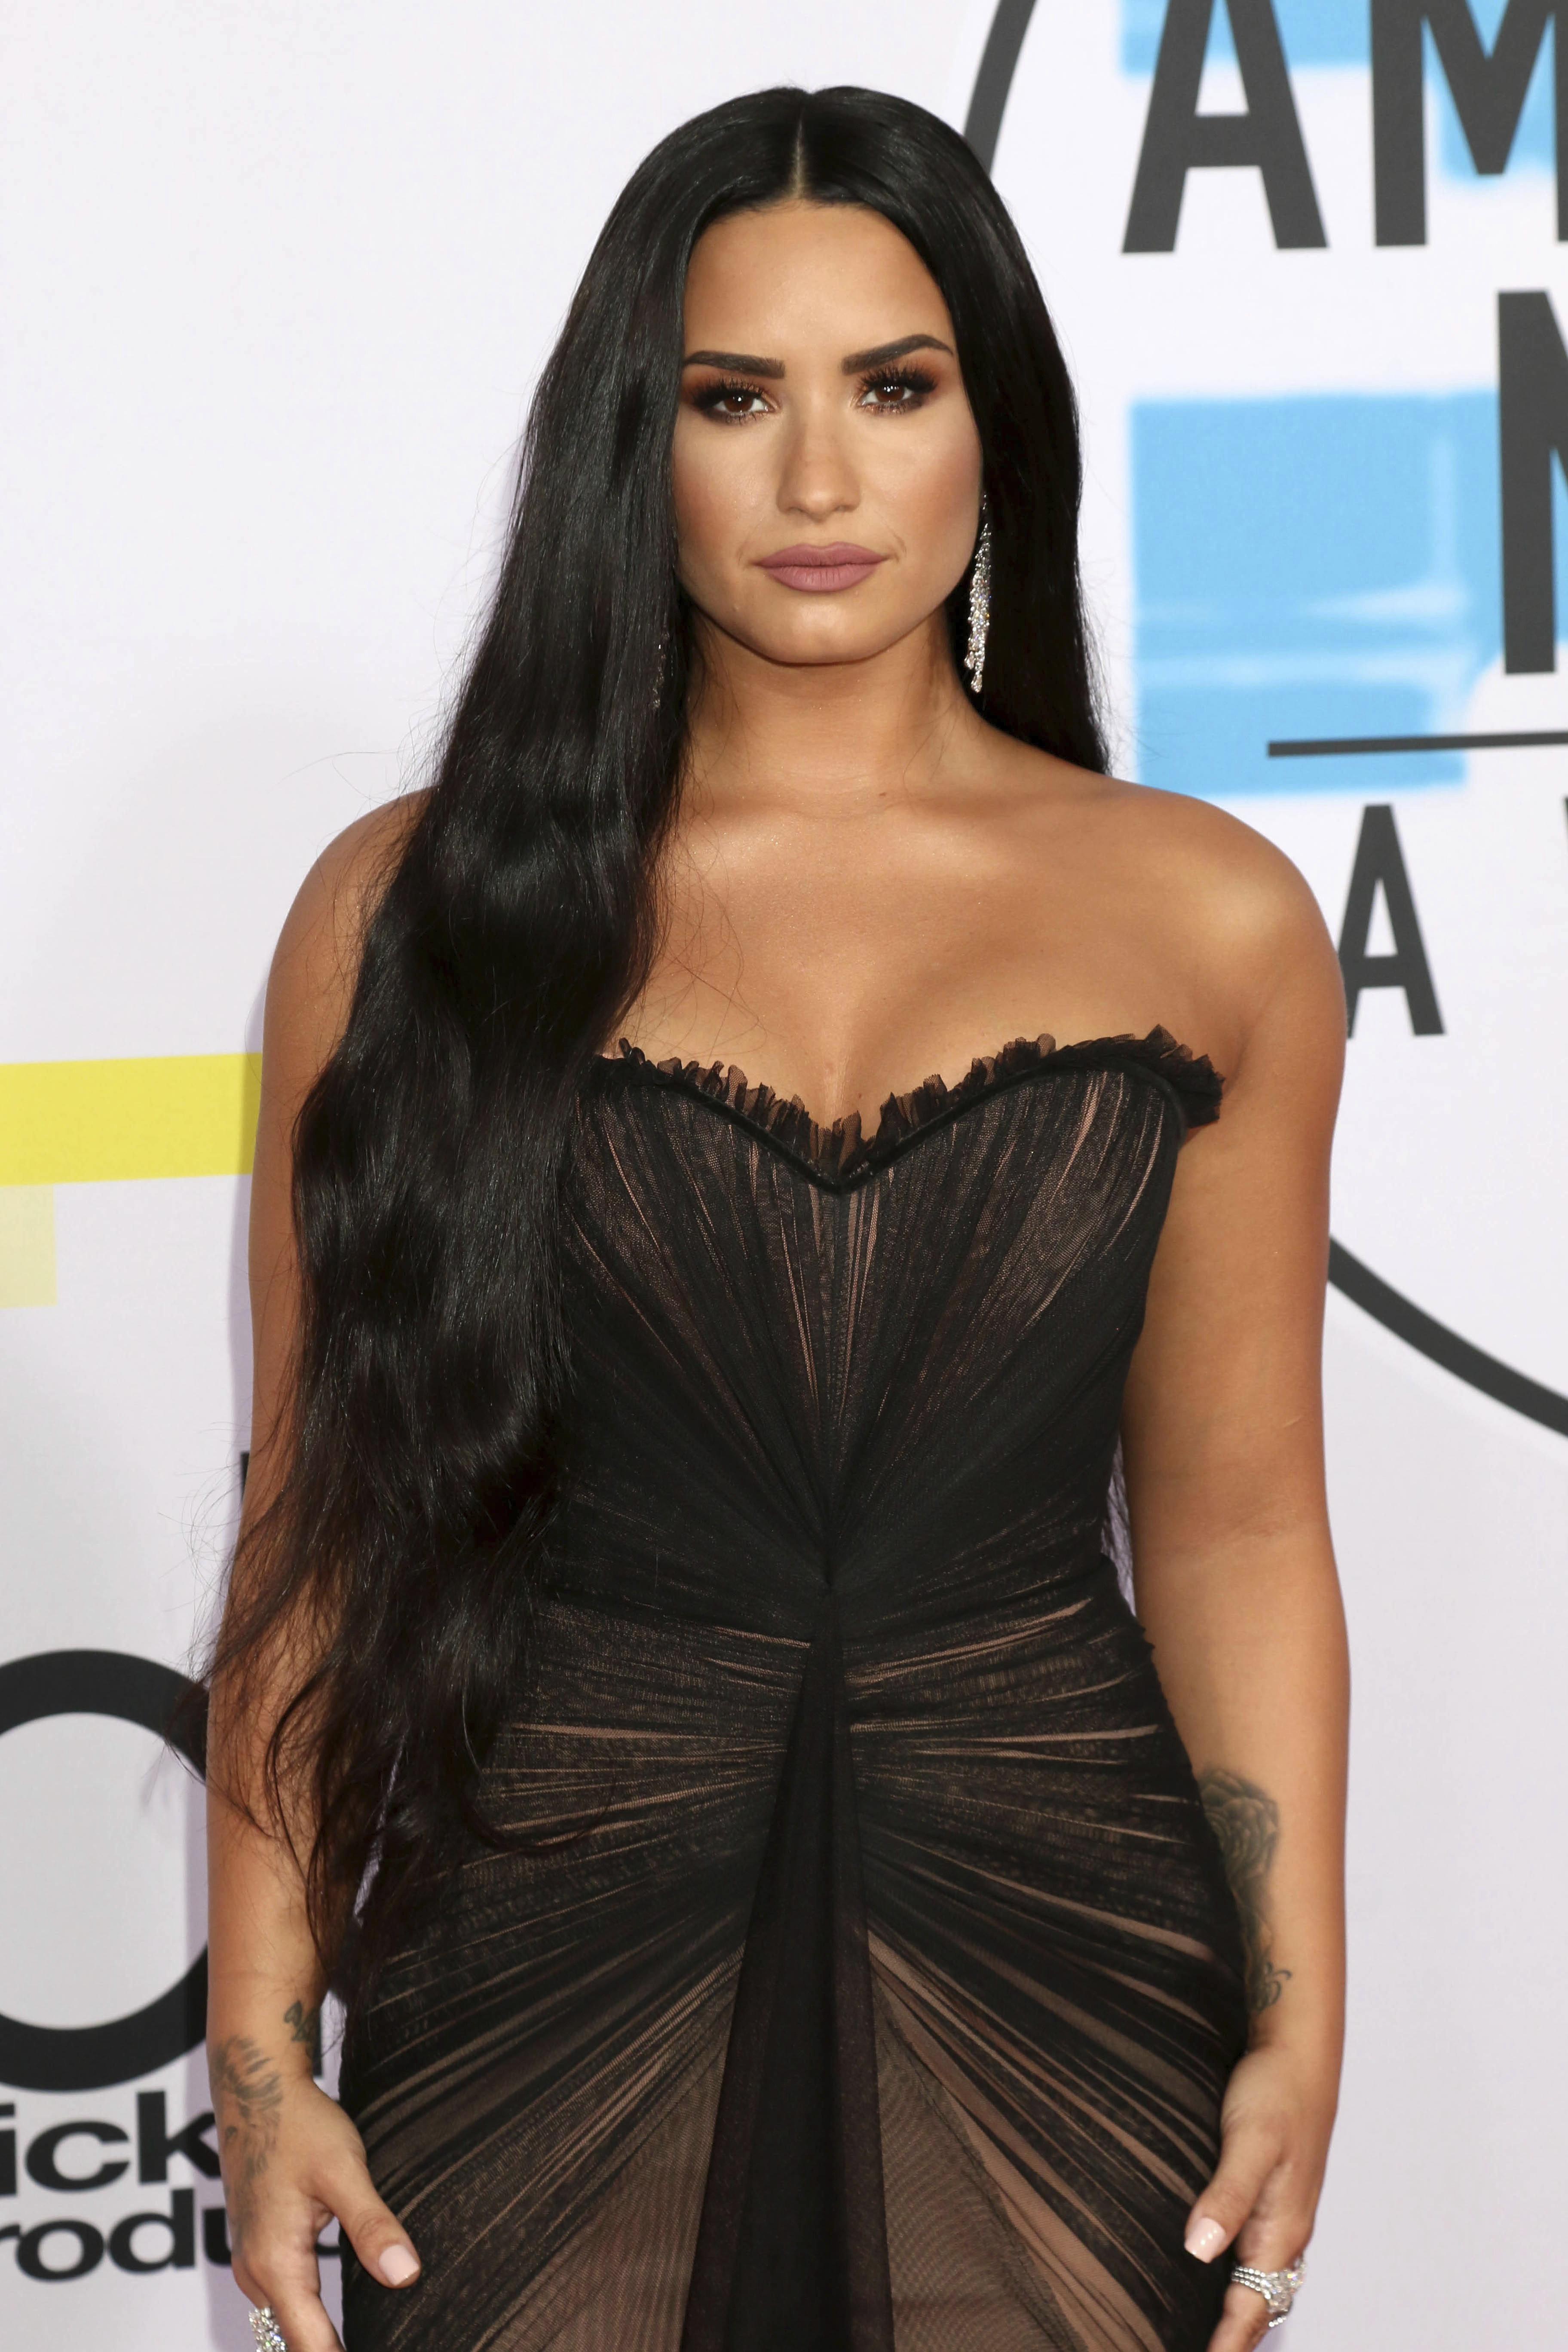 Demi Lovato Celebrates Christmas Days After Slamming Tabloid